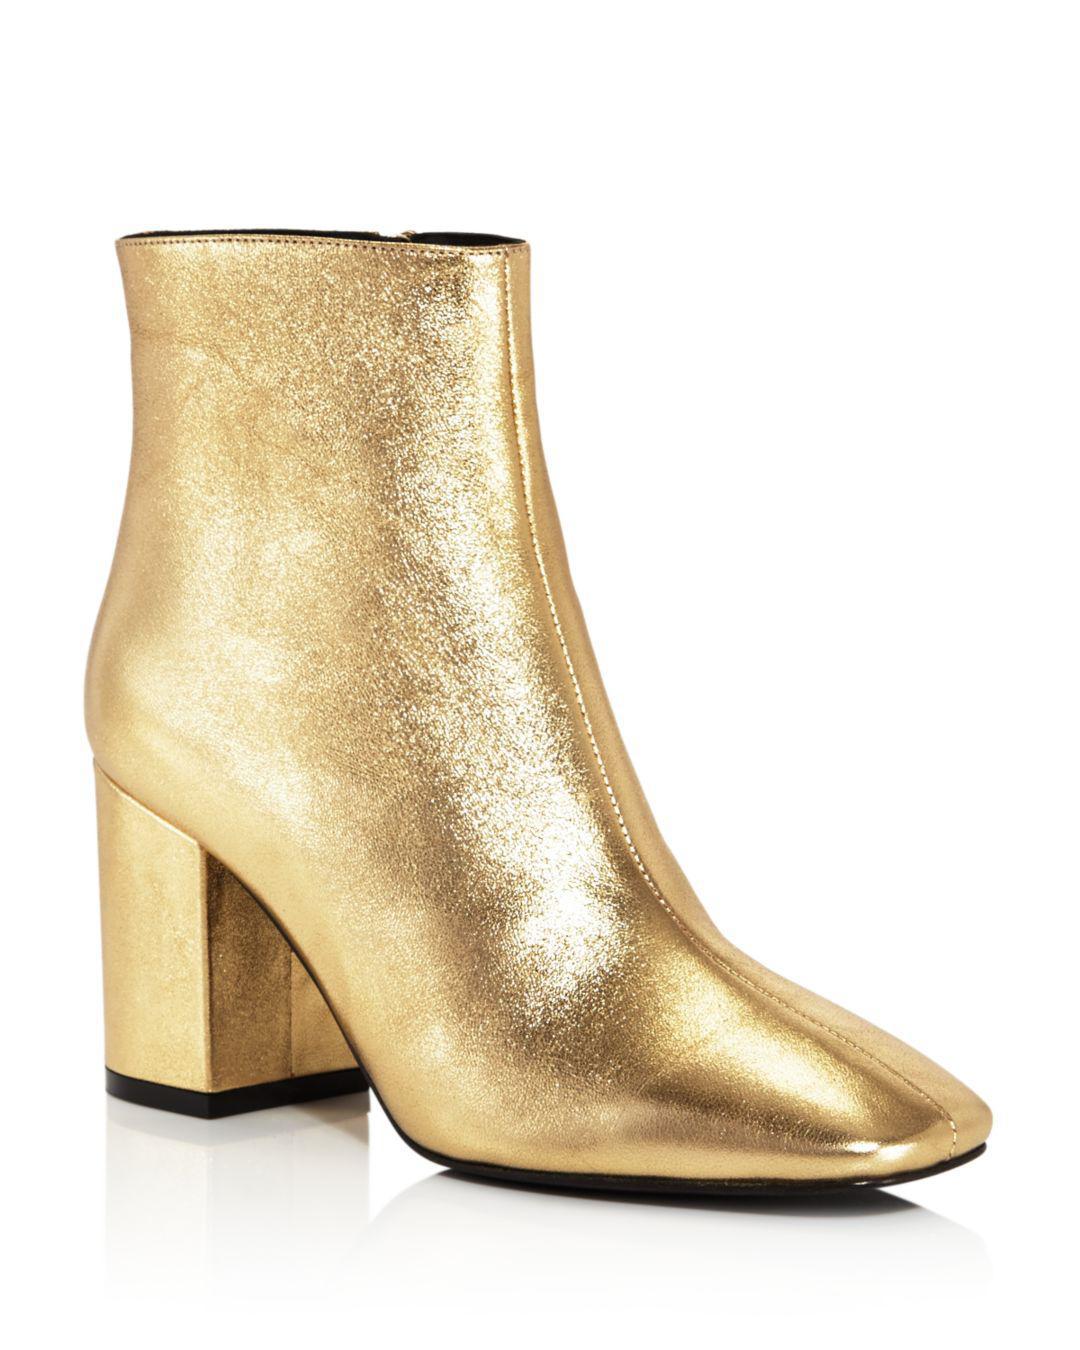 b7b6c989bab18 Lyst - Anine Bing Women s Jane Leather Block Heel Booties in Metallic